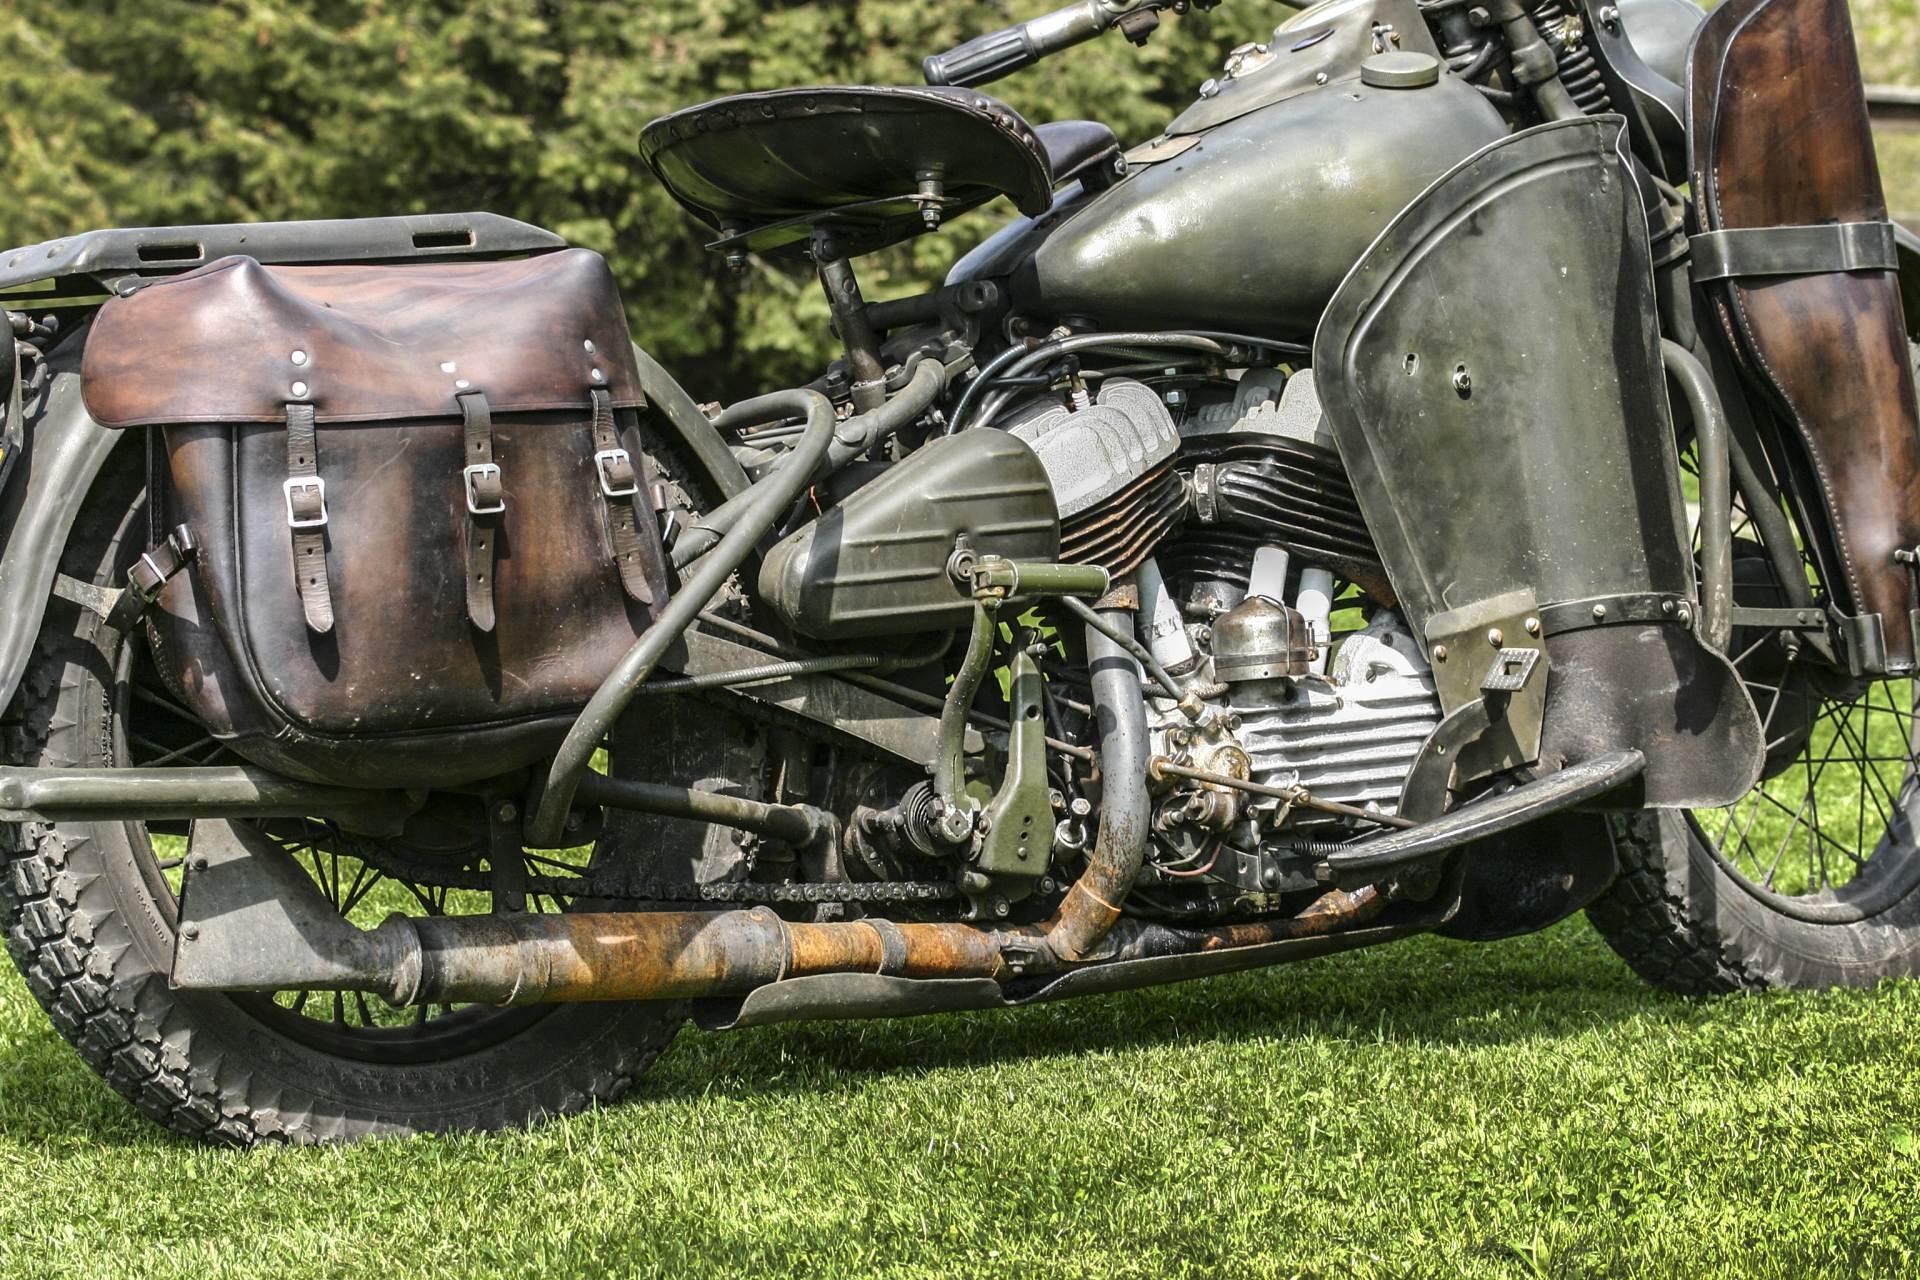 Harley Davidson WLA 42. Amerykański motor wojskowy